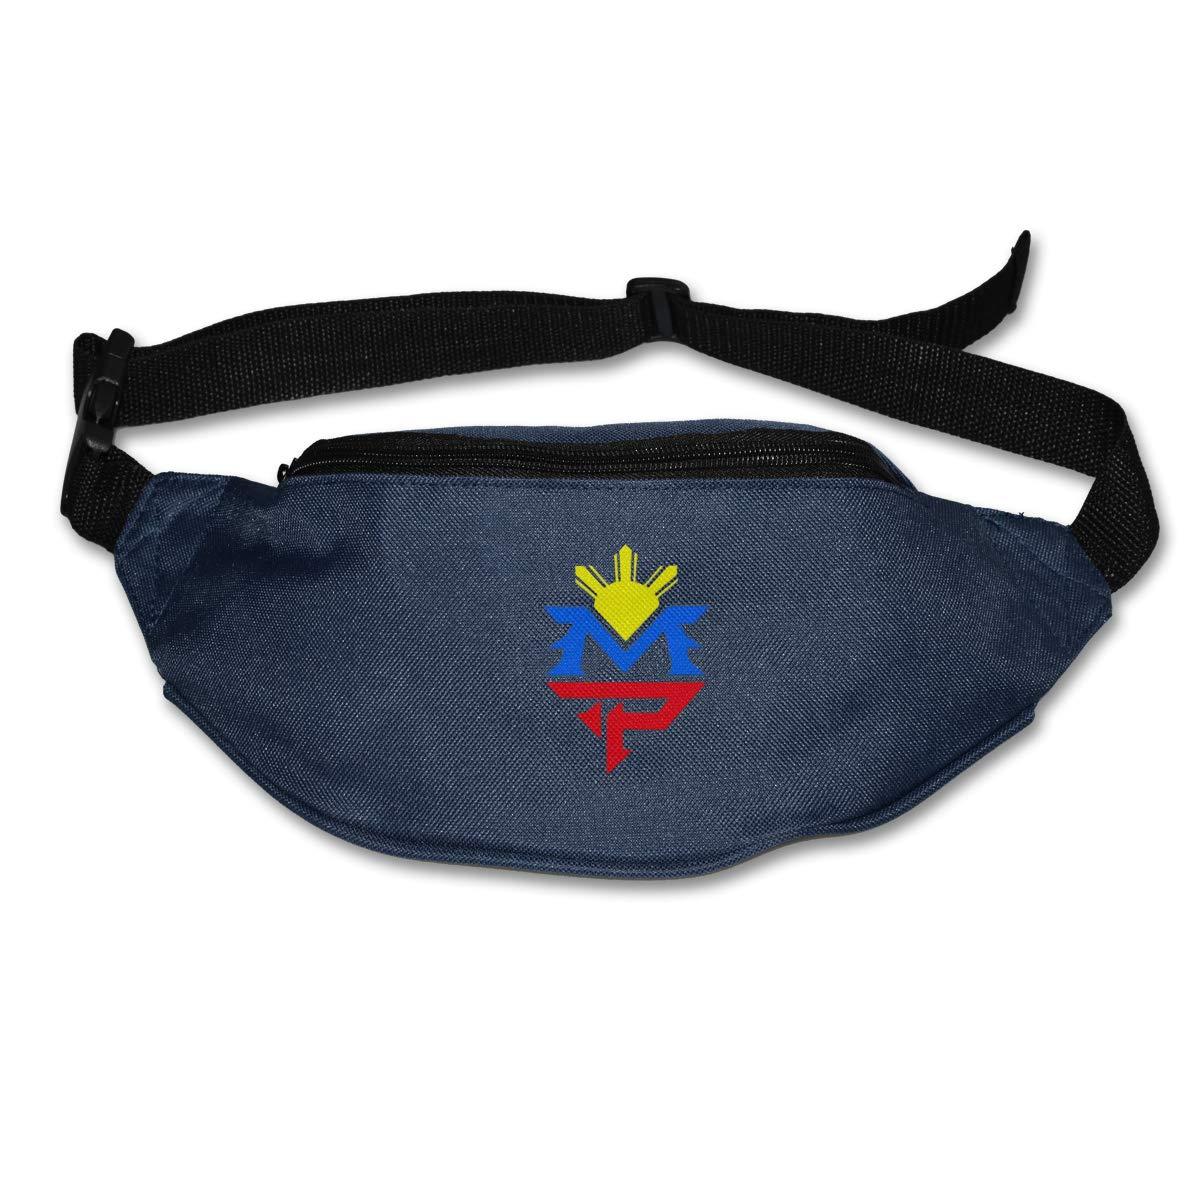 Pacquiao Mp Pack Waist Bag Travel Pocket Sling Chest Shoulder Bag Phone Holder Running Belt With Separate Pockets